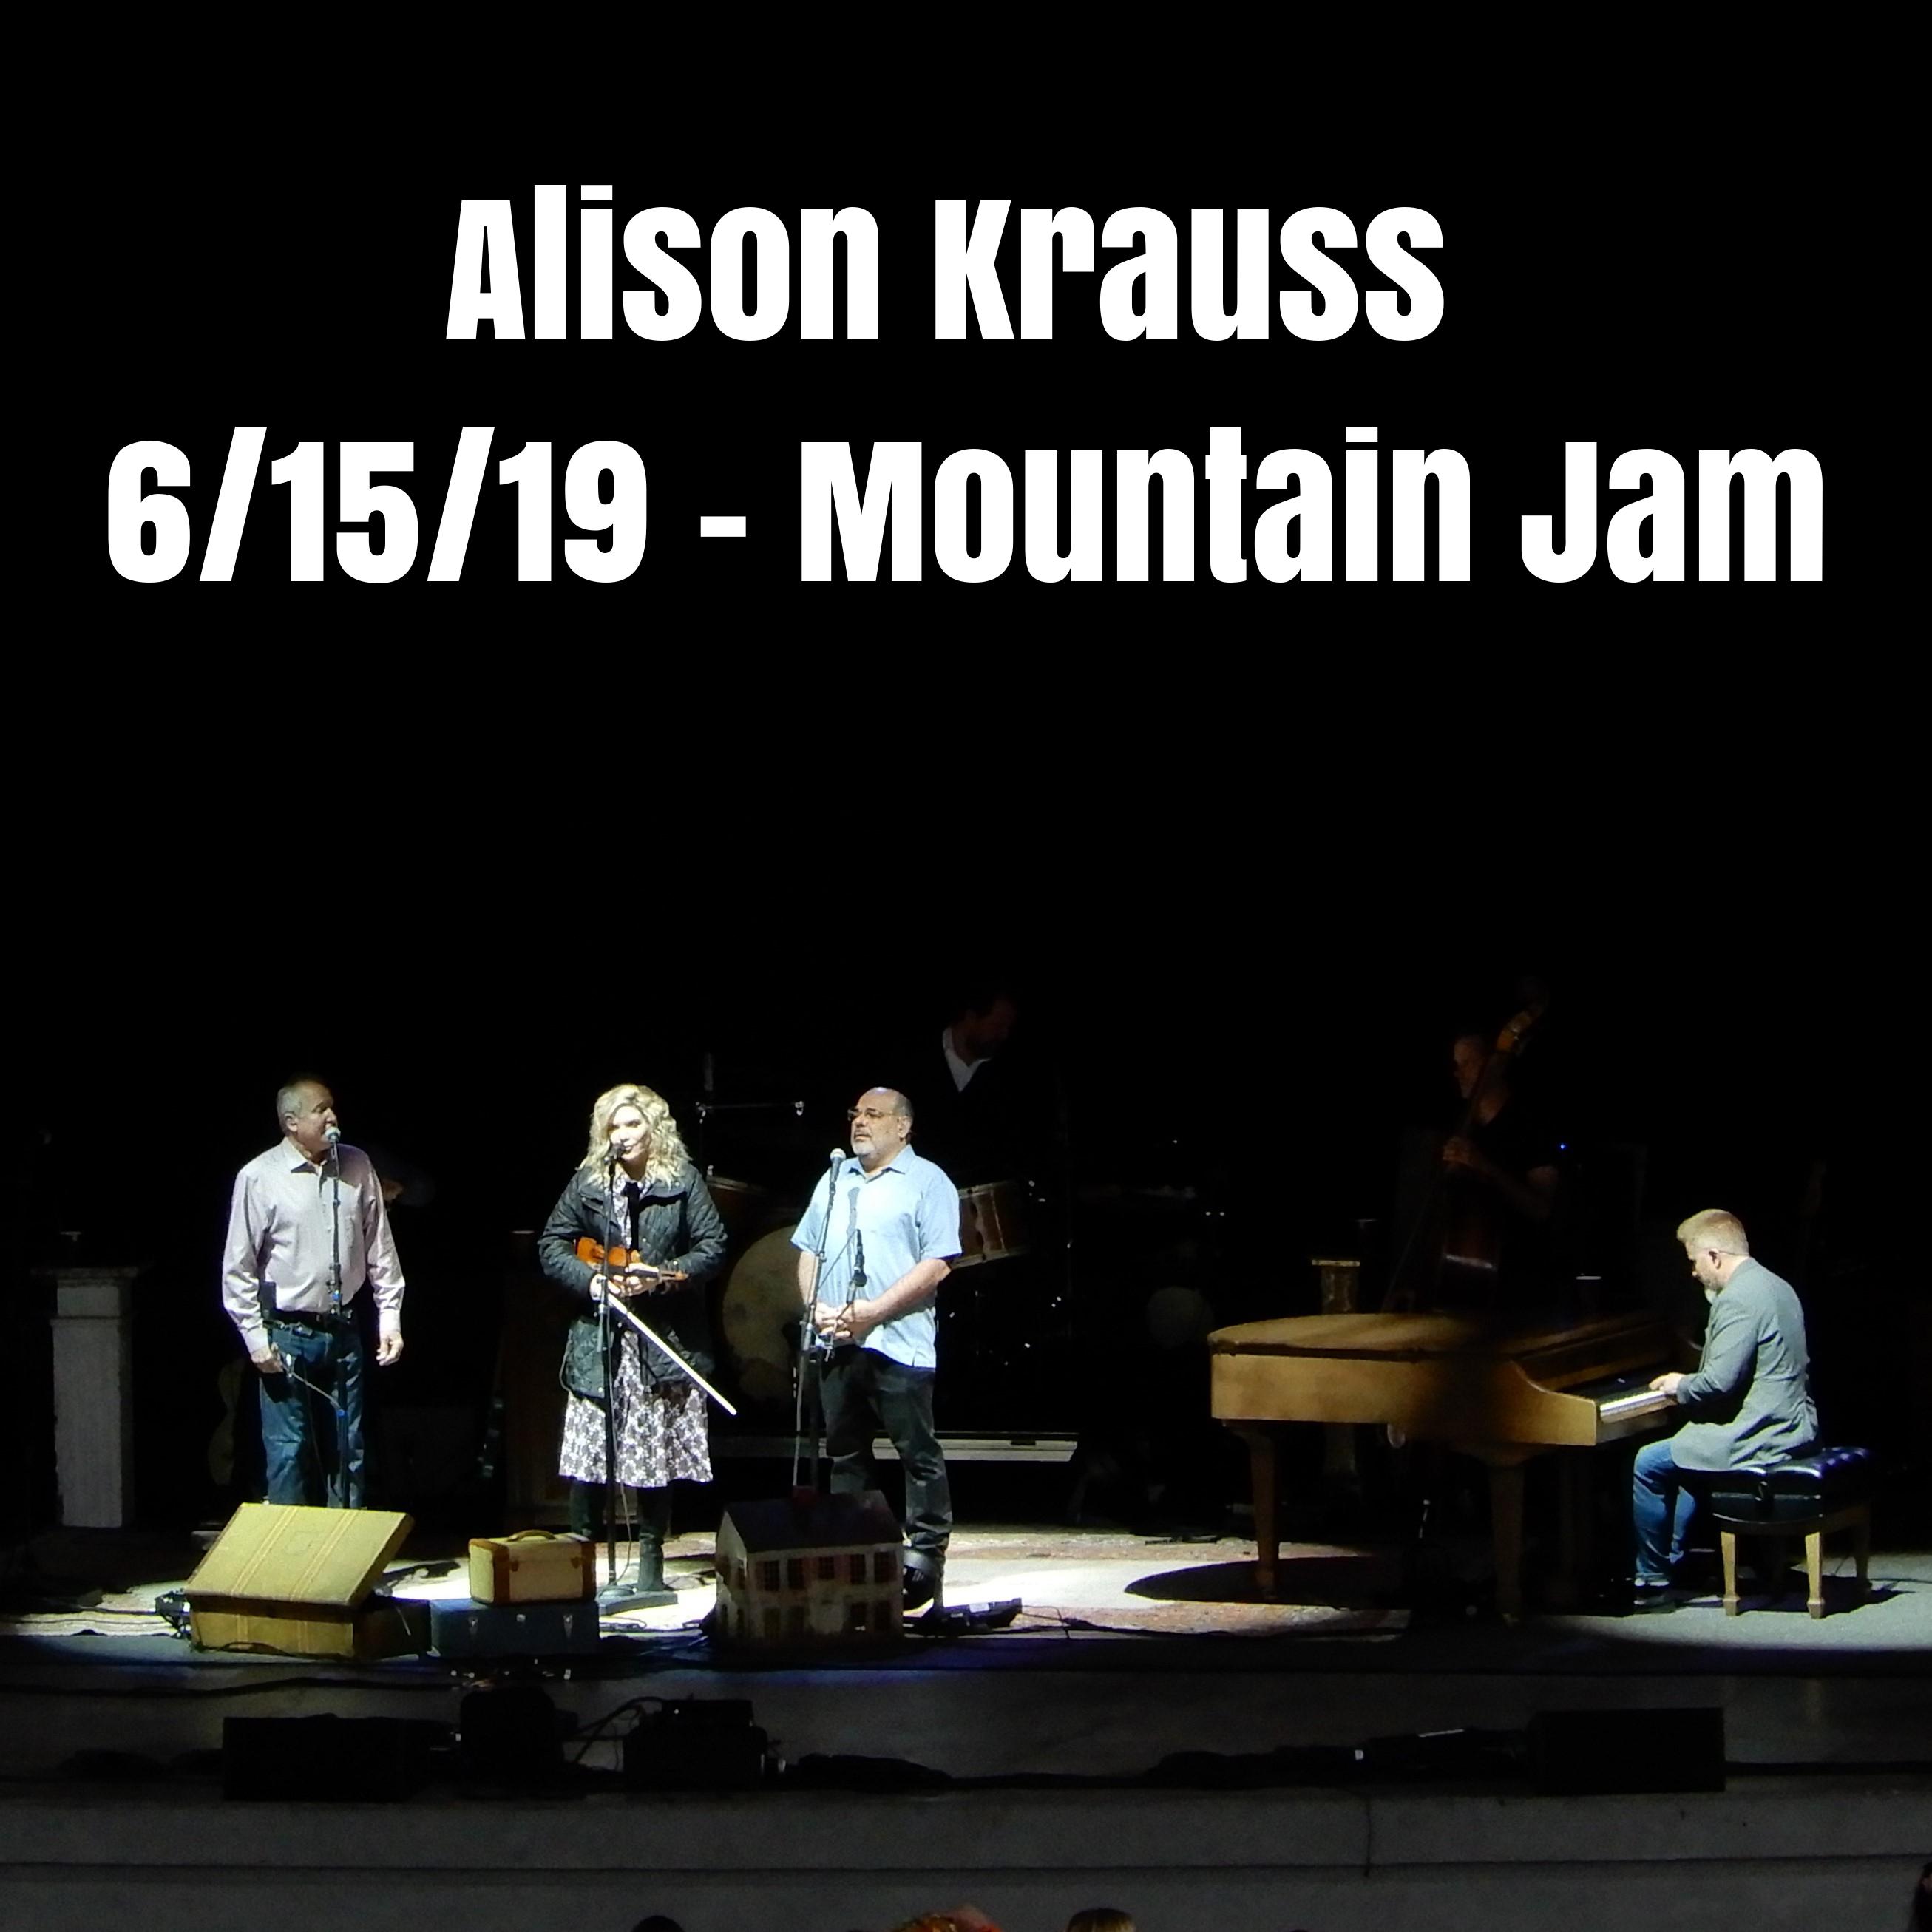 AlisonKrauss2019-06-15MountainJamBethelNY.jpg